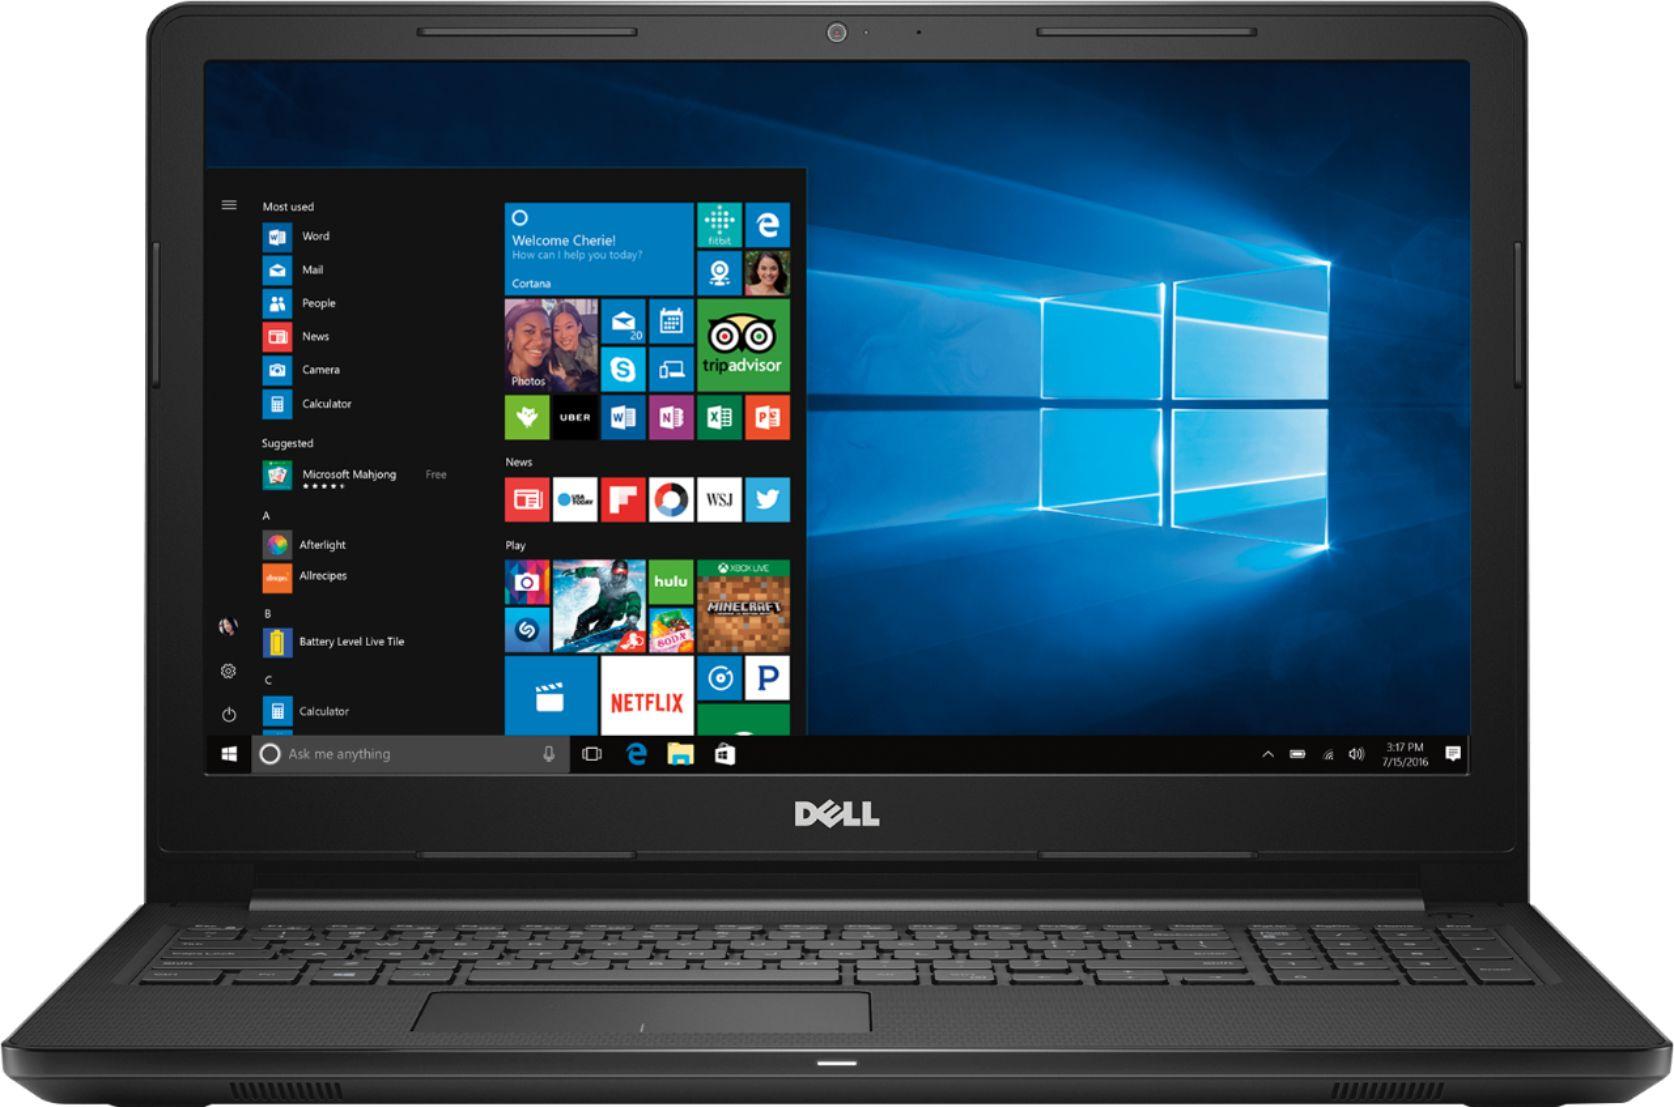 "Dell - Inspiron 15.6"" Laptop - AMD A6-Series - 4GB Memory - AMD Radeon R4 - 500GB Hard Drive - Black"